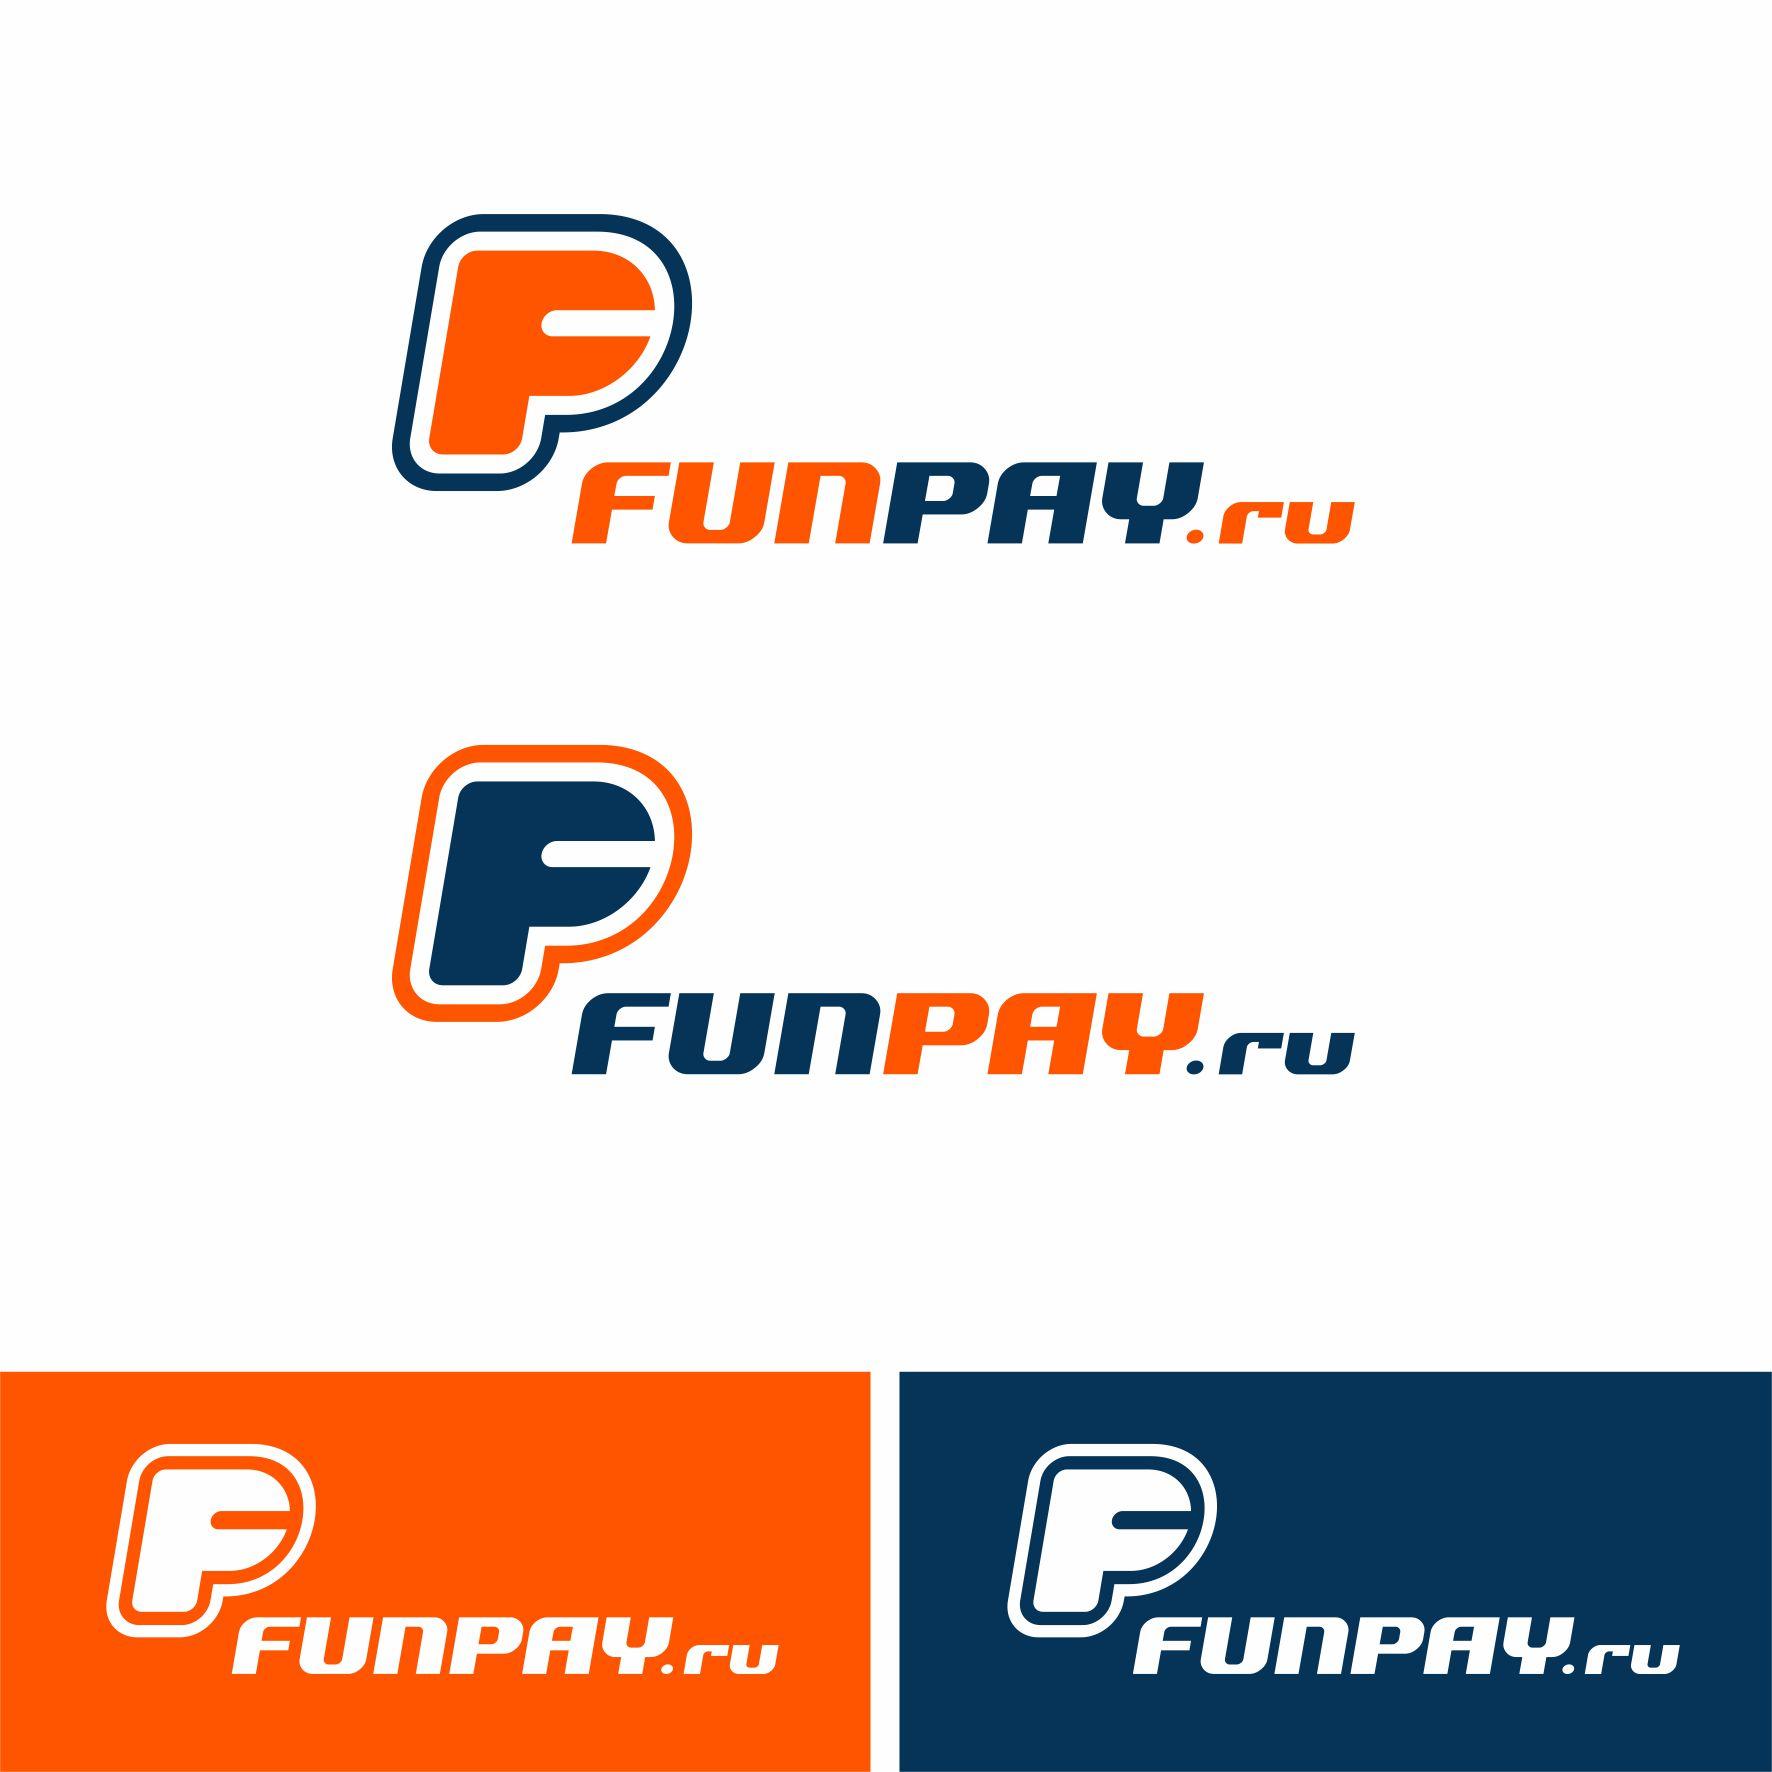 Логотип для FunPay.ru фото f_45159916e4c07c25.jpg